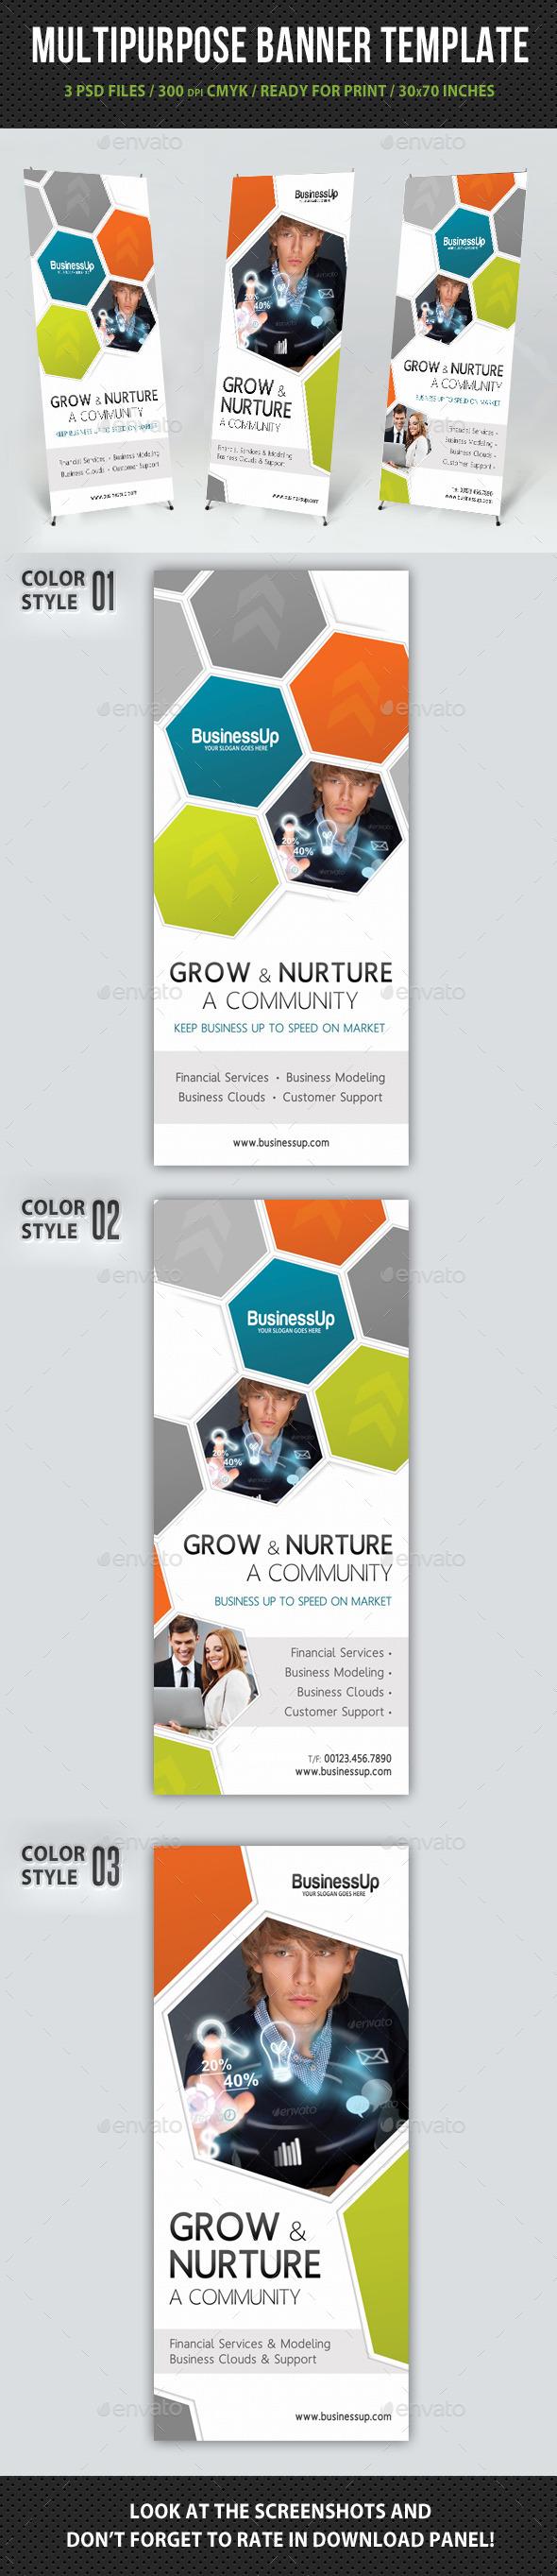 GraphicRiver Multipurpose Banner Template V08 10717025